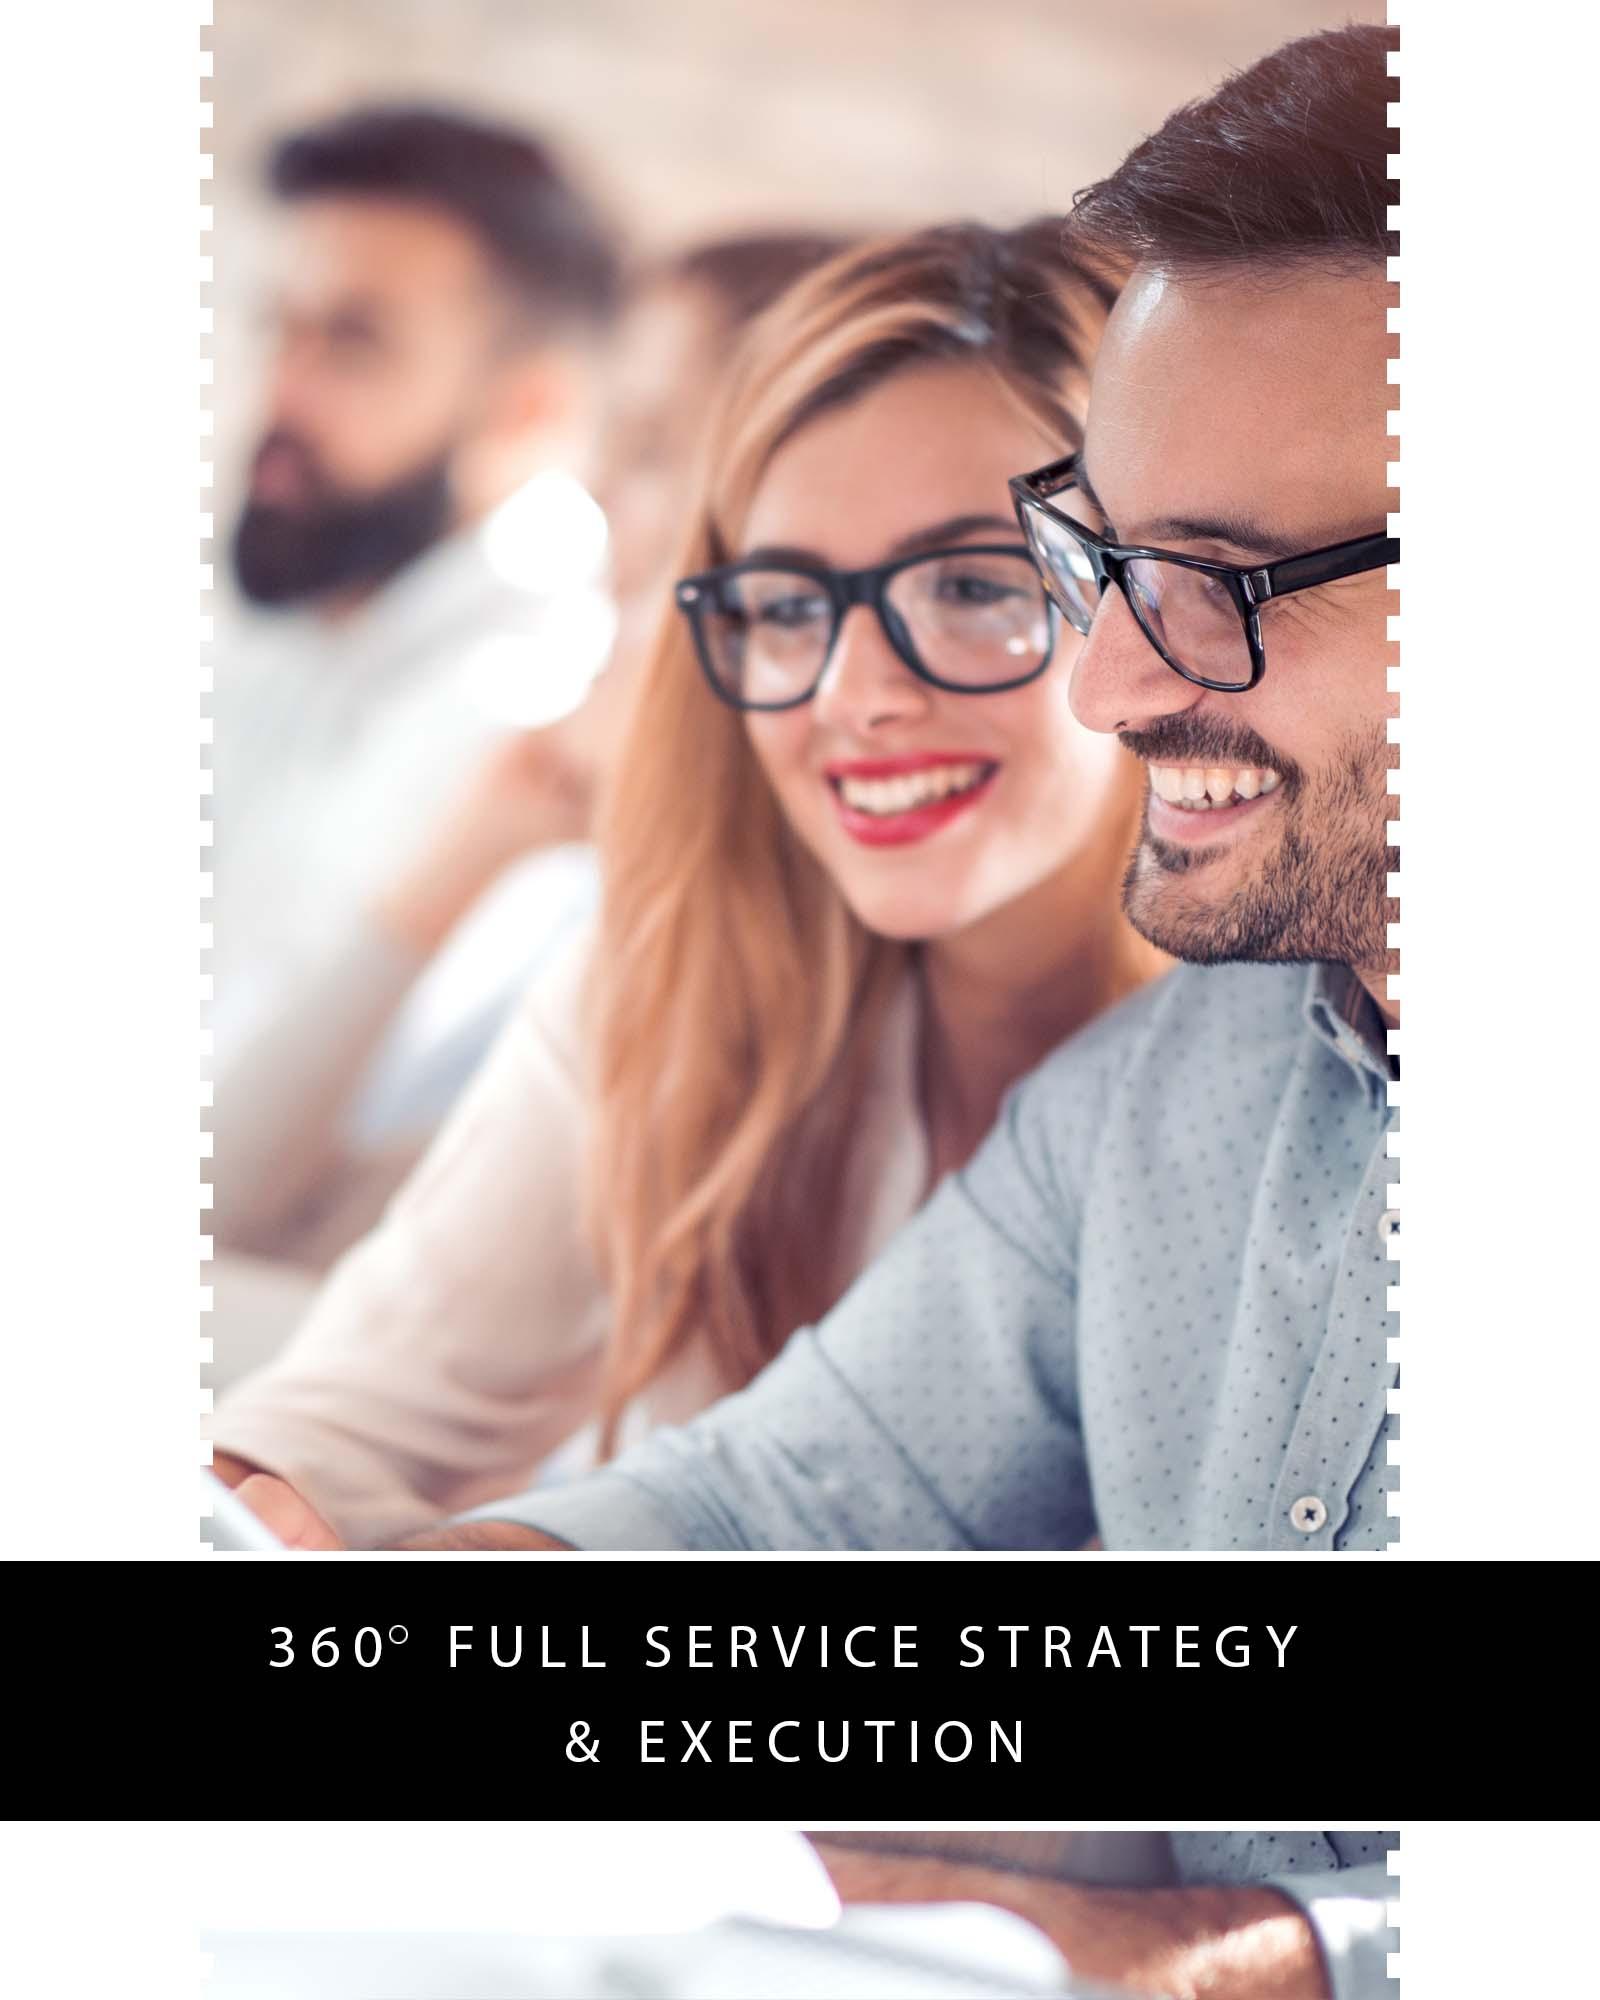 full service marketing and brand strategy 360.jpg